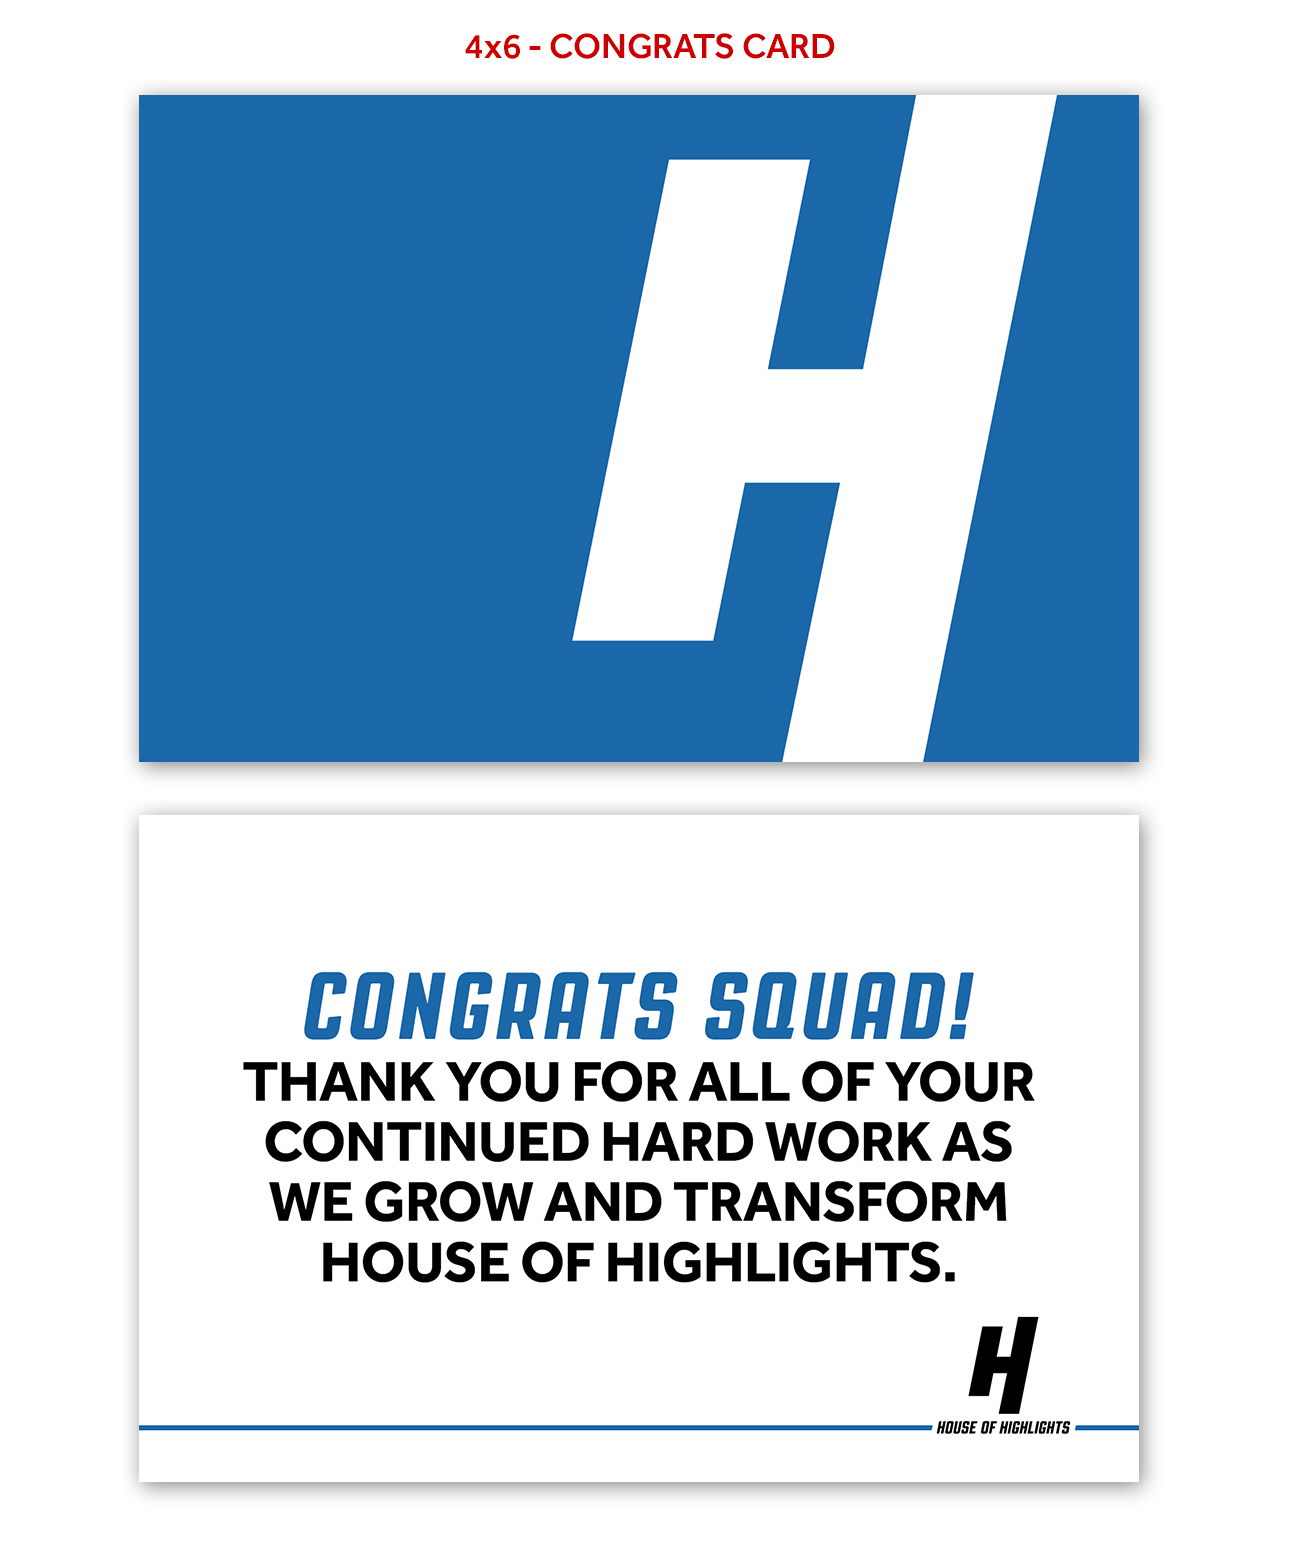 visual_HoH_10mm_Congrats_Card_4x6_v5.jpg